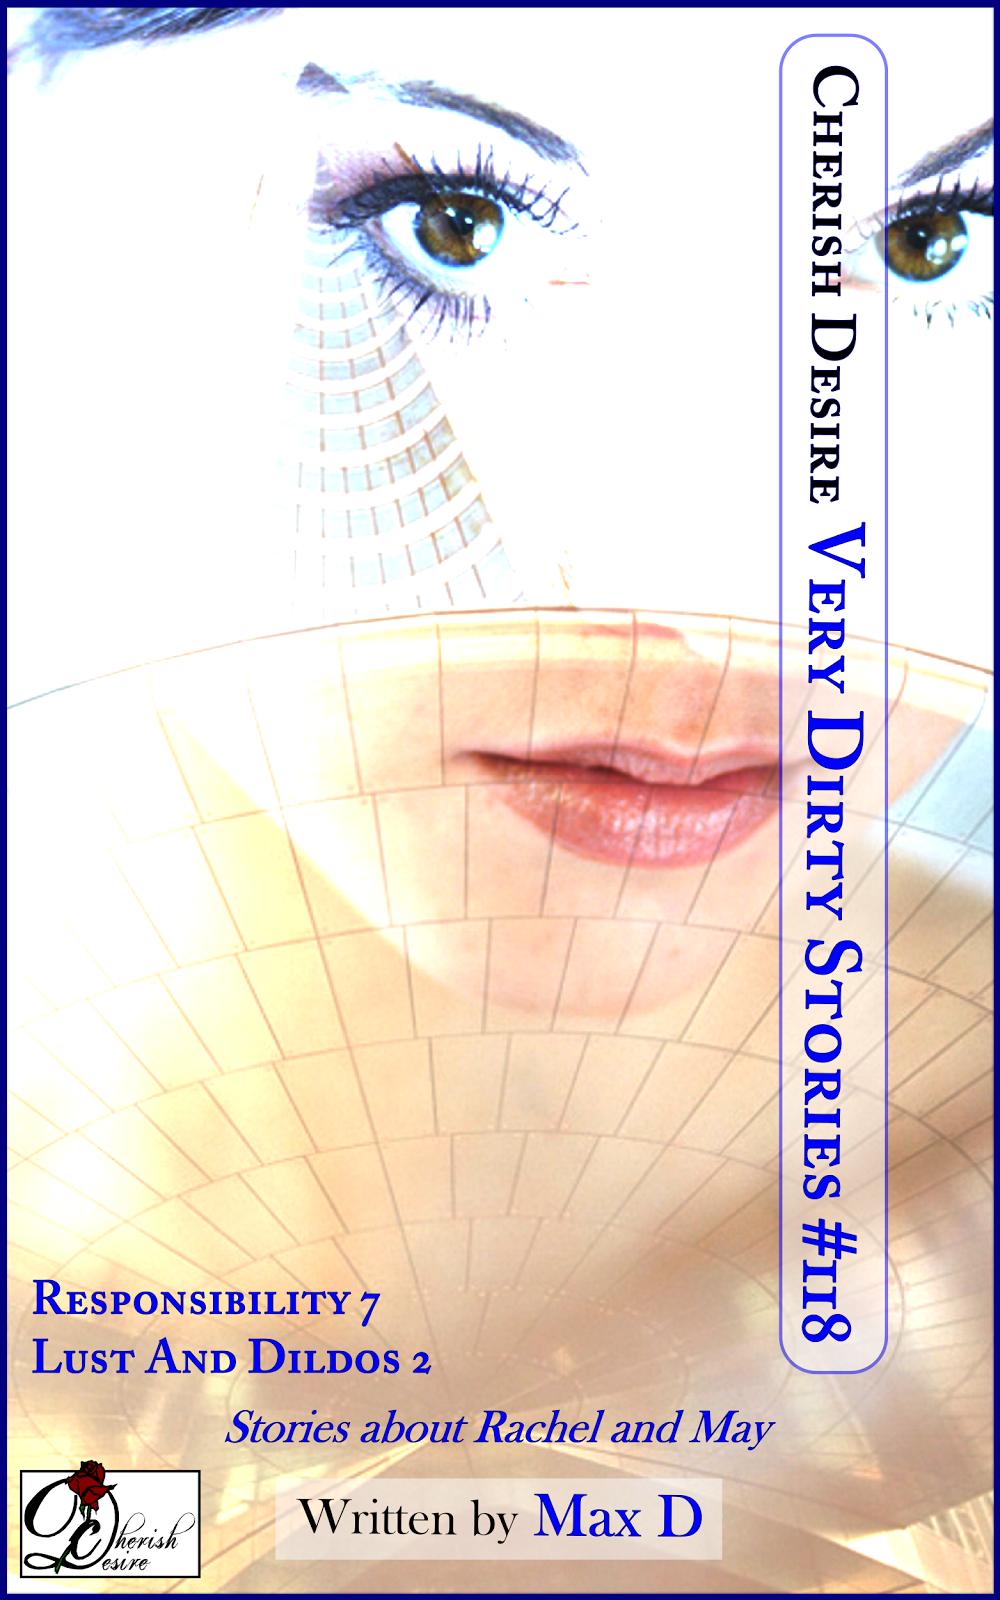 Cherish Desire: Very Dirty Stories #118, Max D, erotica